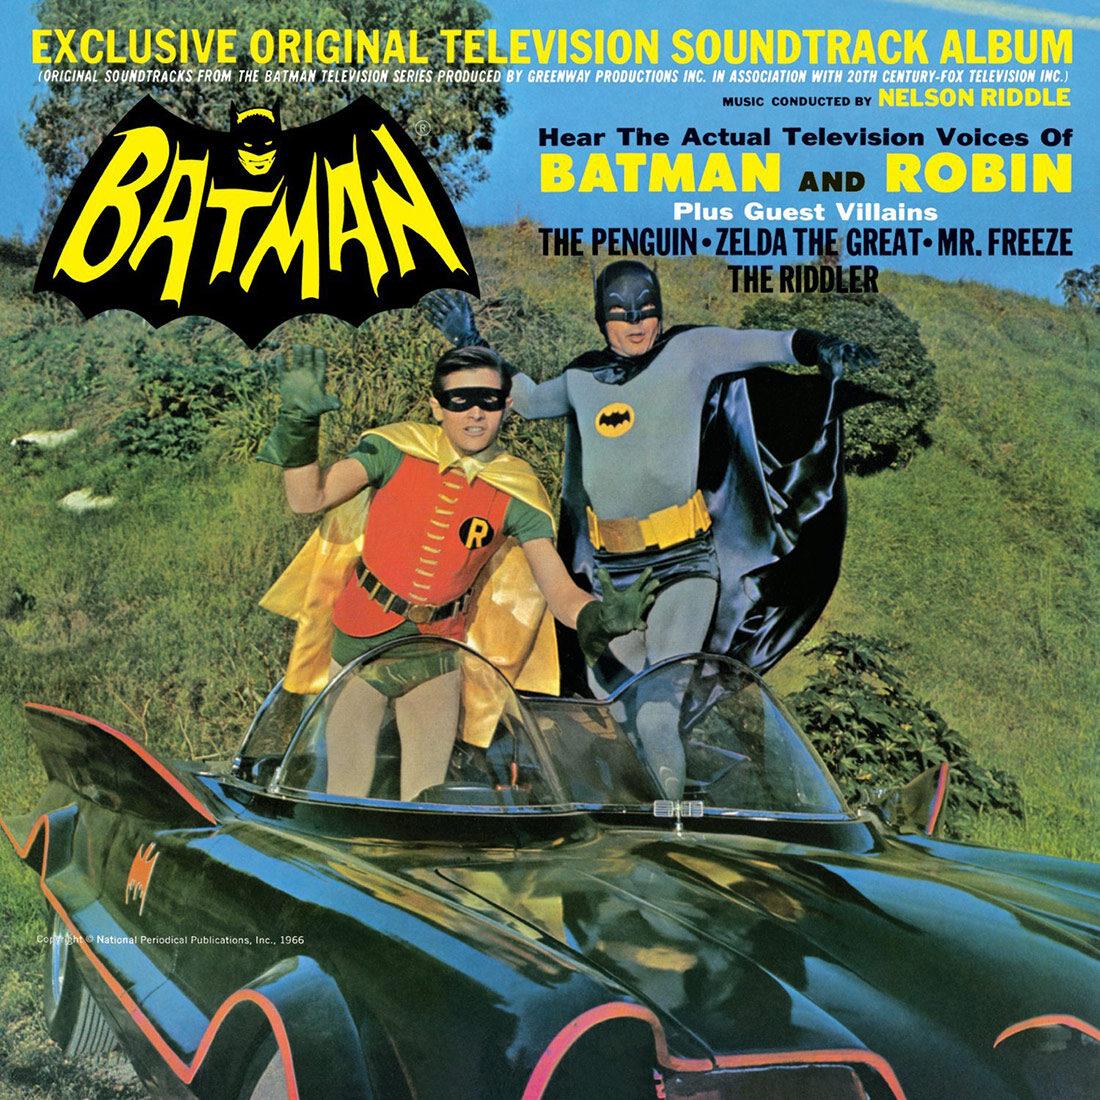 Batman Classic Television Series Exclusive Original Television Soundtrack Album Limited Vinyl Edition